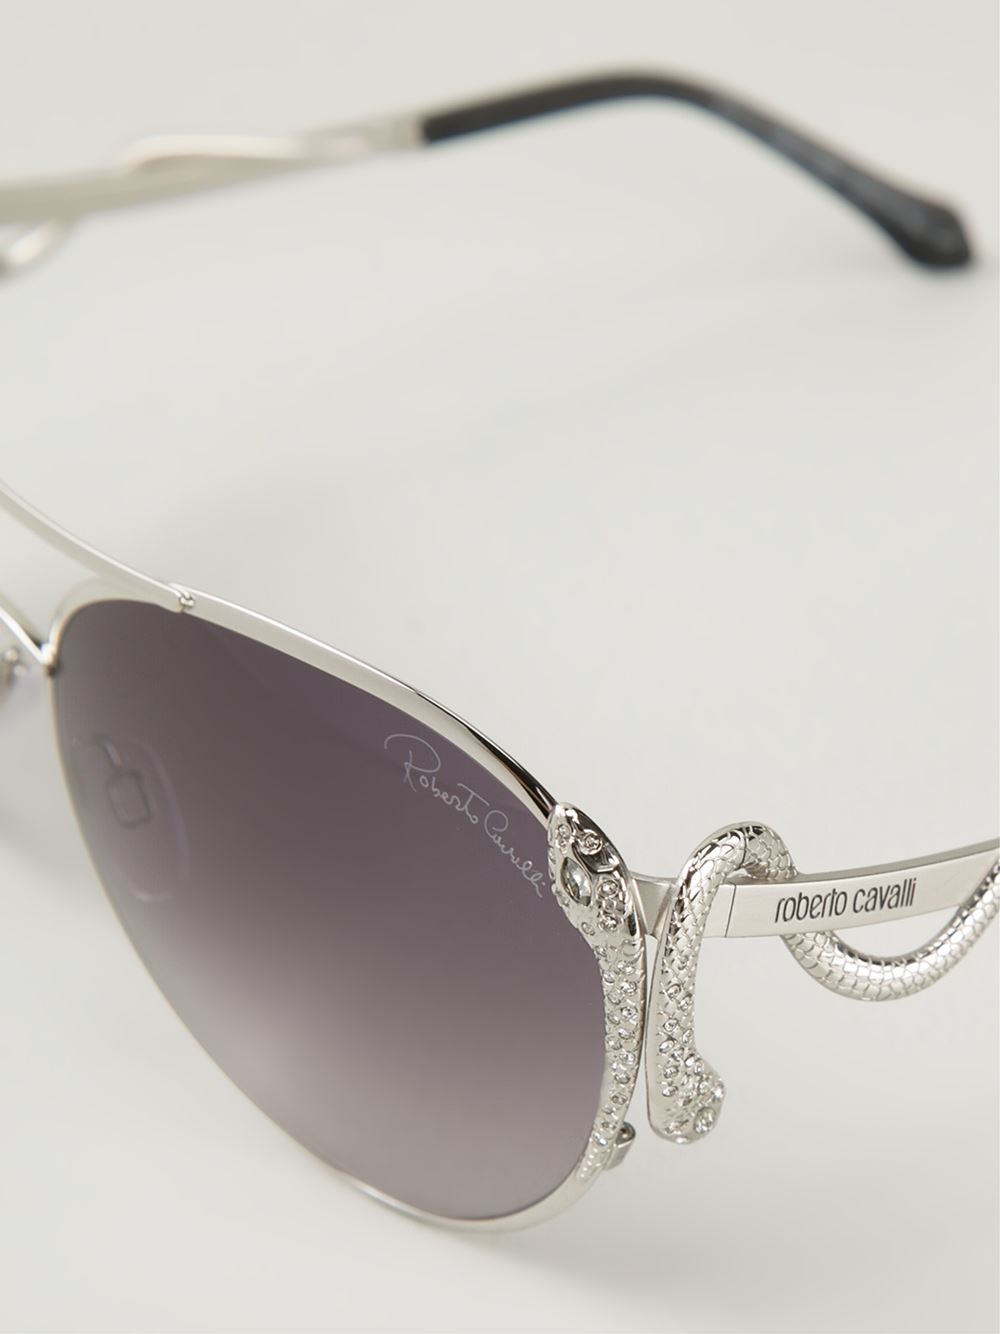 cavalli sunglasses k4wn  cavalli sunglasses